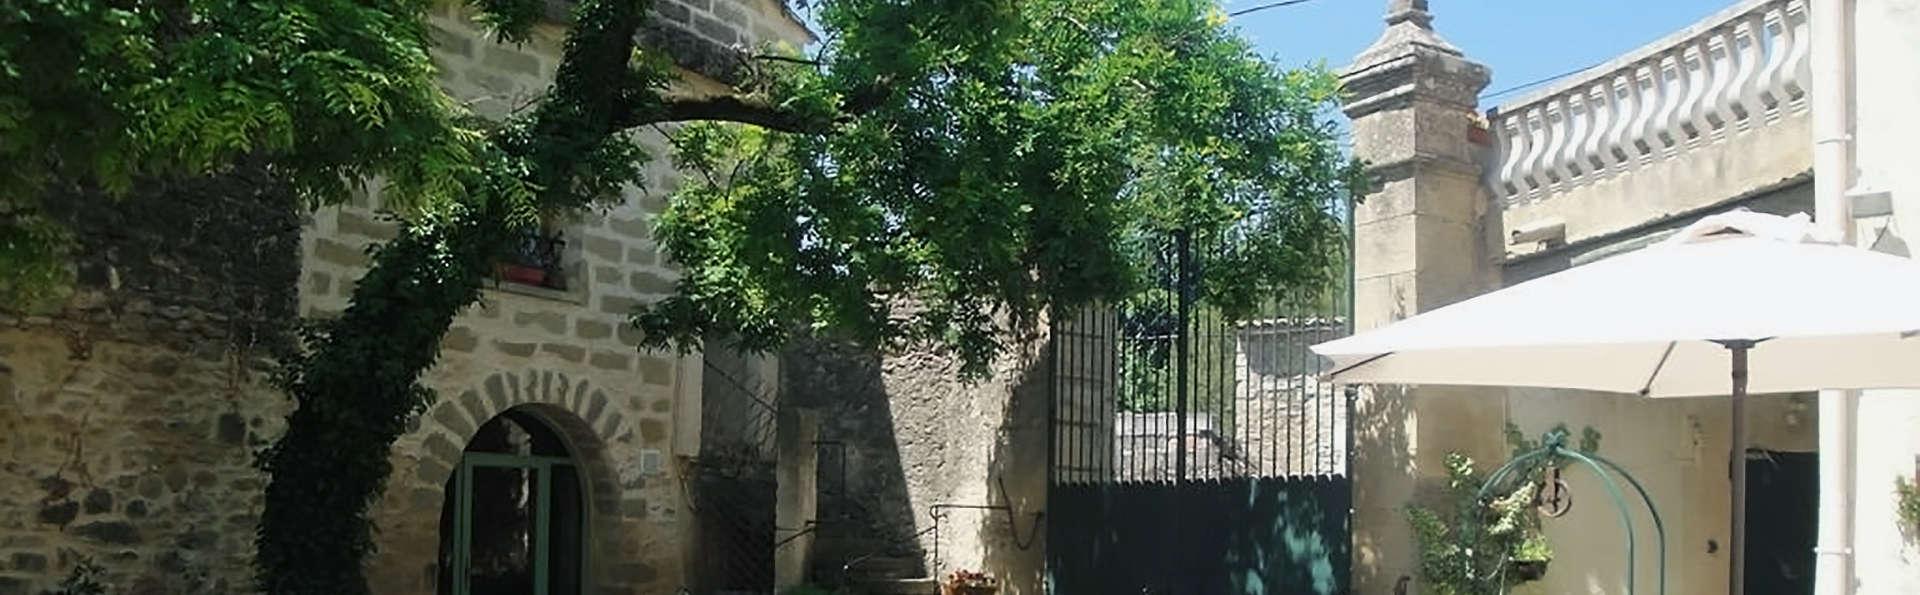 Bastide de la Treille - EDIT_Fachada.jpg